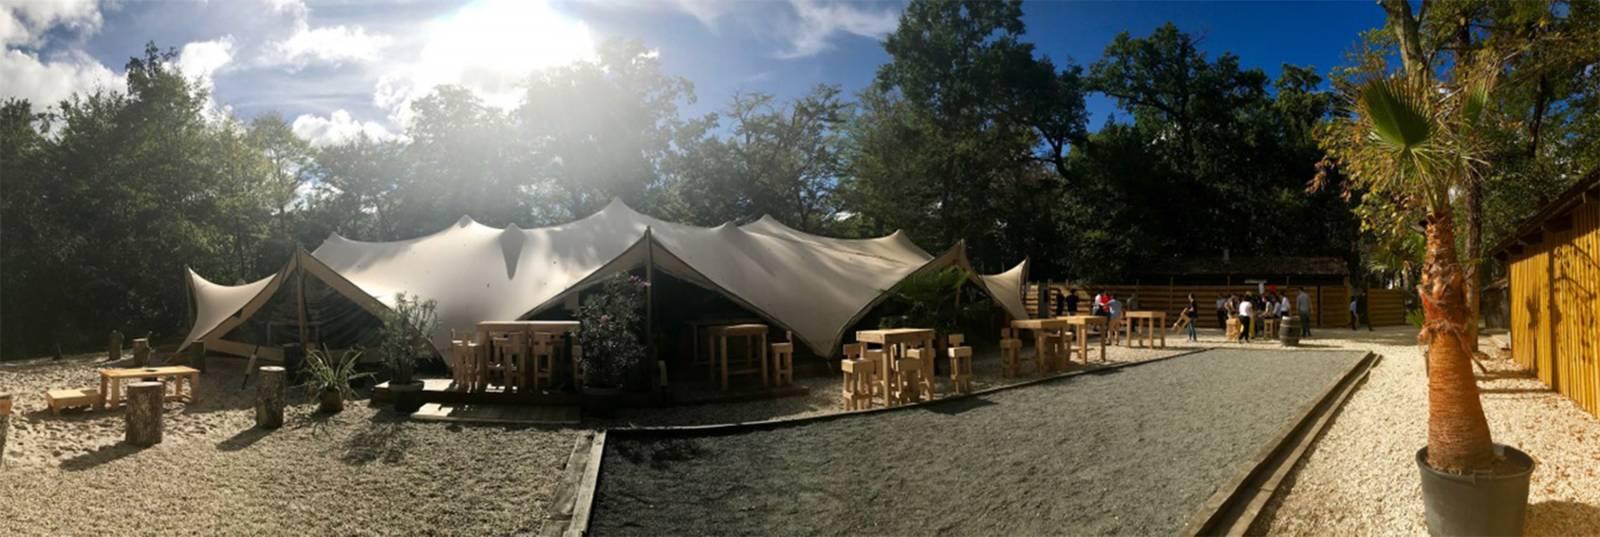 Organic-Concepts - Tenten - Feesttenten - Verhuur Tenten - Stretch - White Cloud Tent 600m2 - House of Events - 1